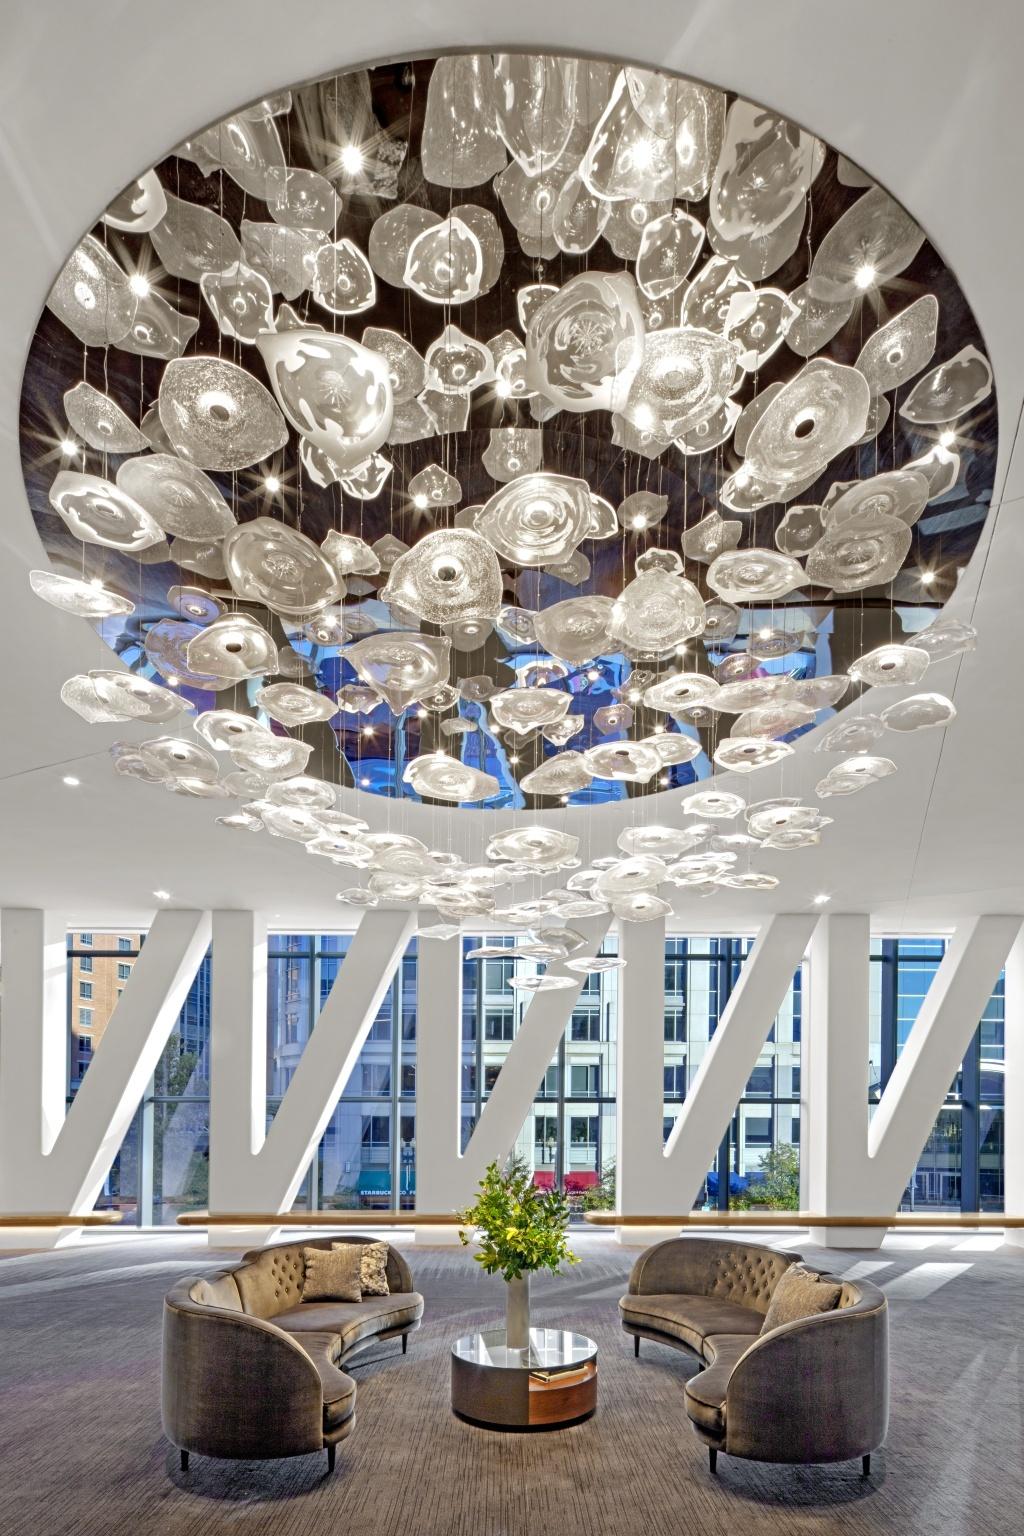 Preciosa Lighting - Conrad hotel Washington 2